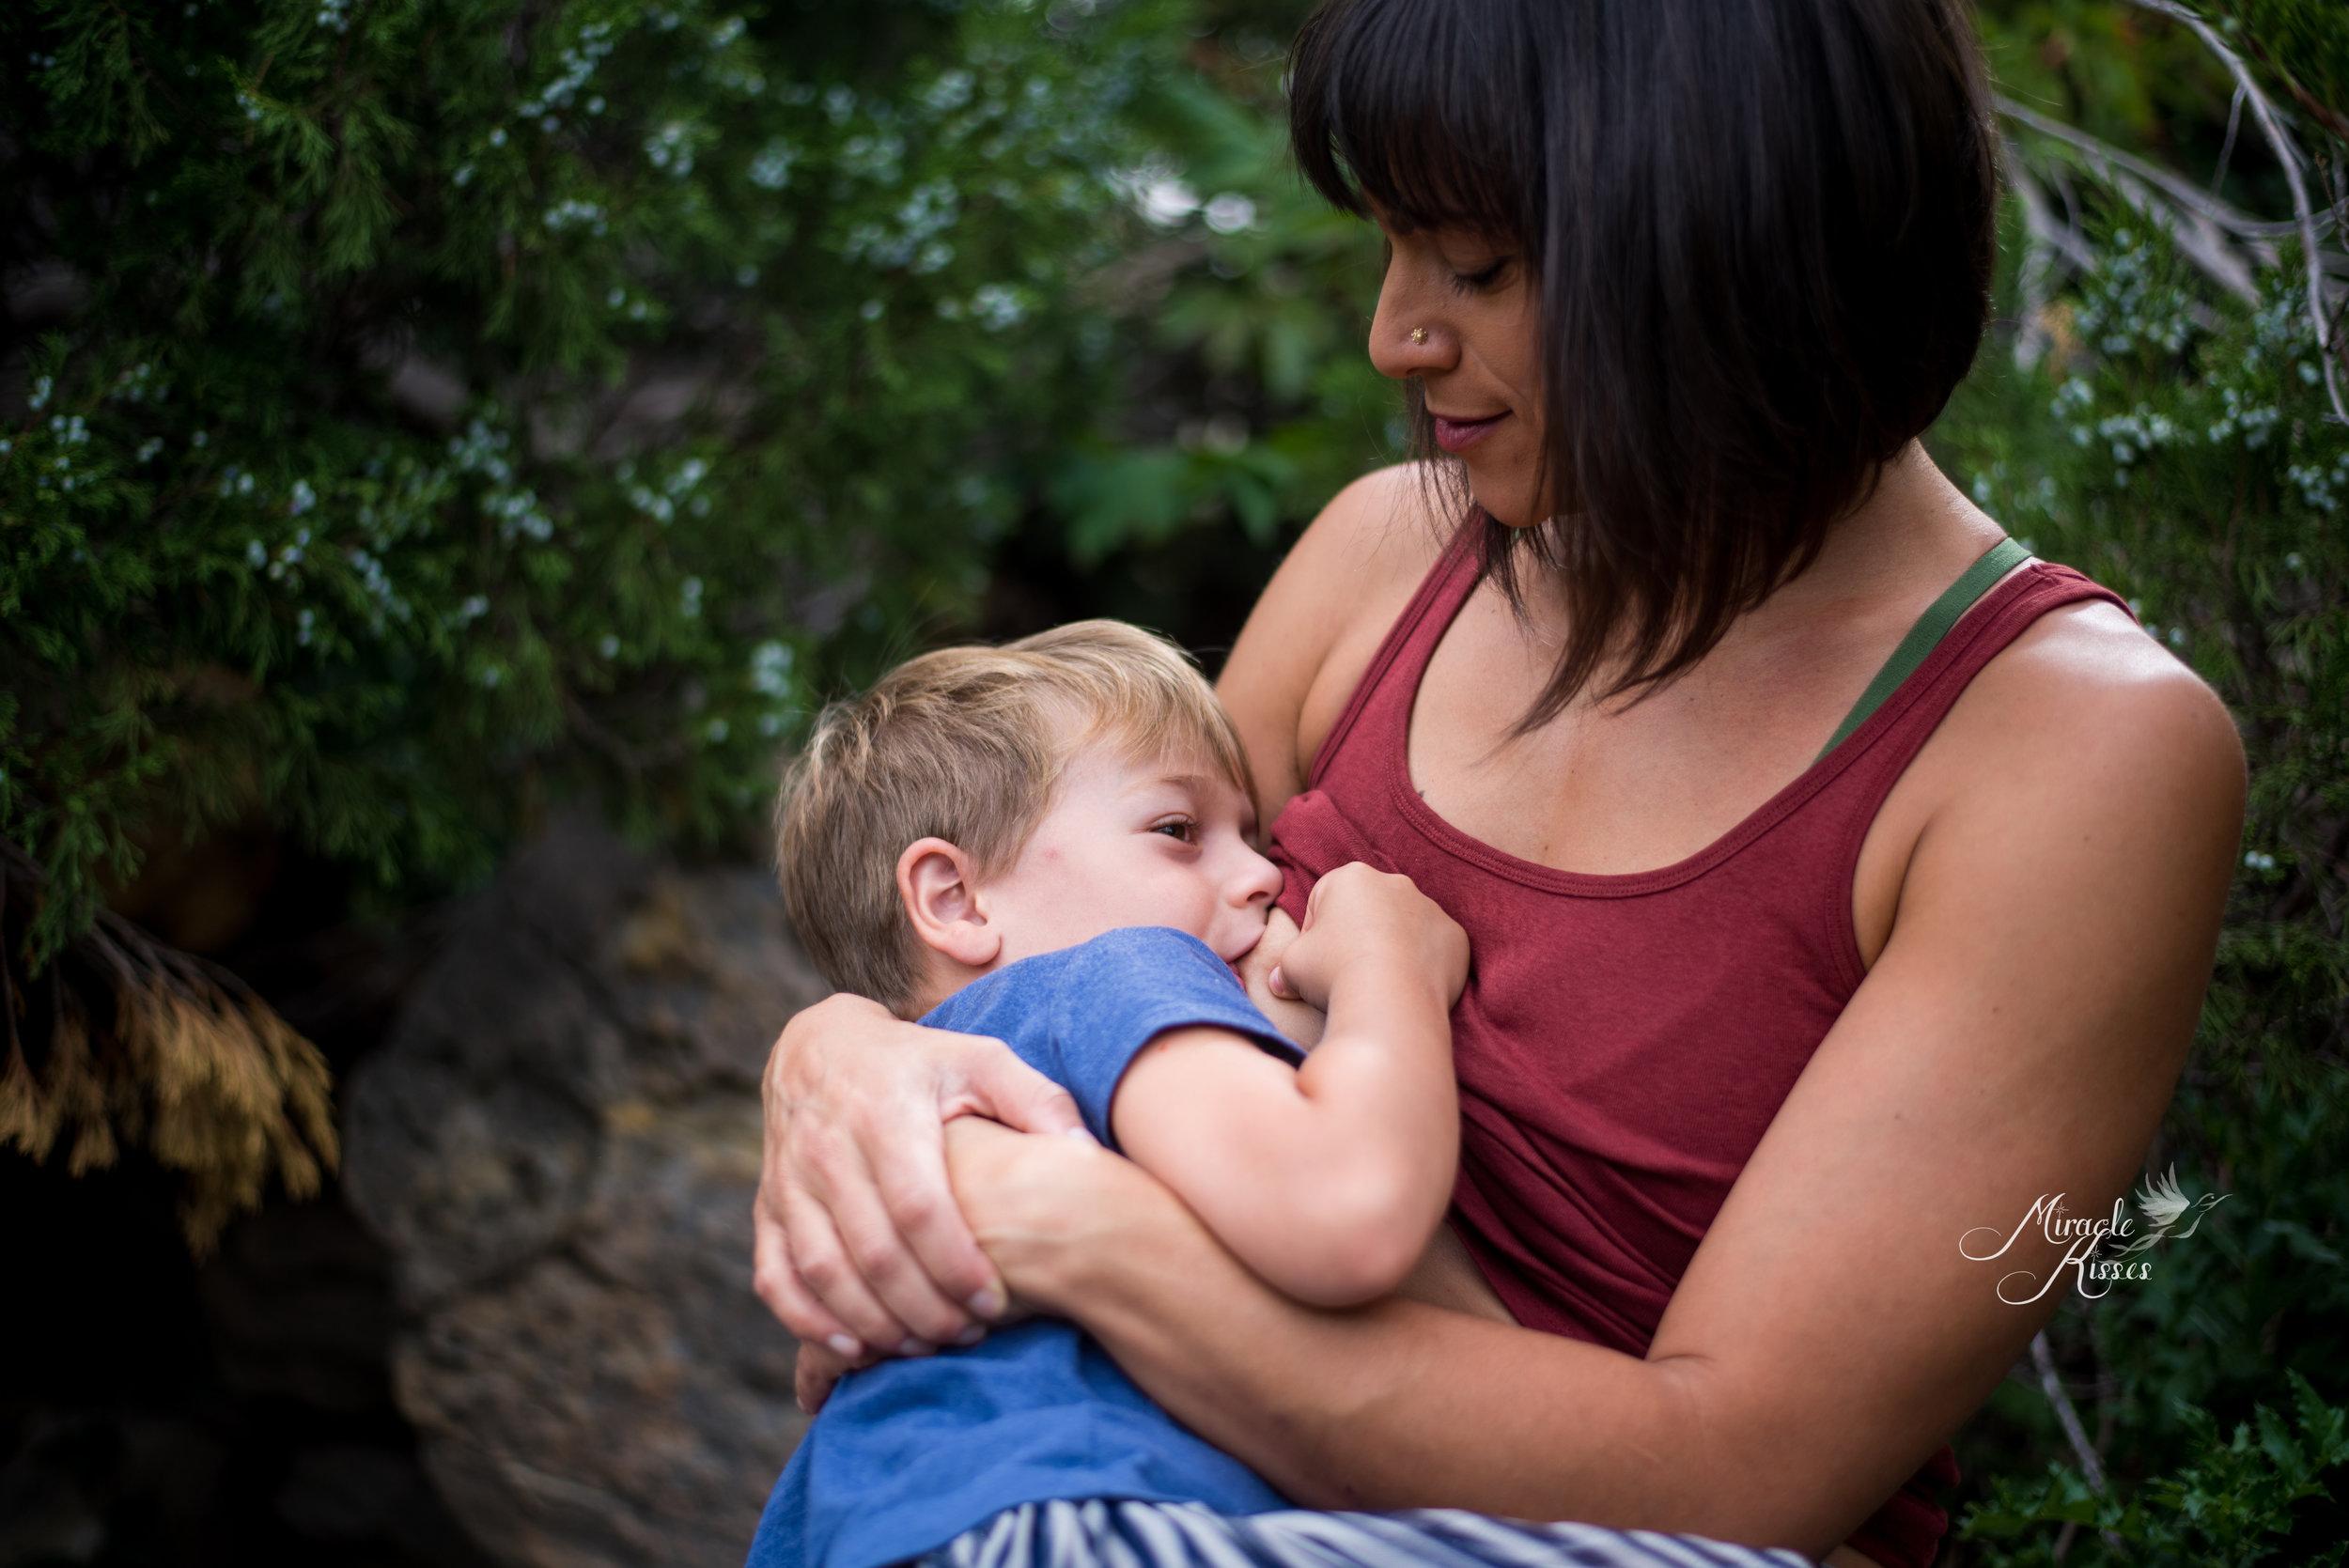 world breastfeeding week, extended breastfeeding